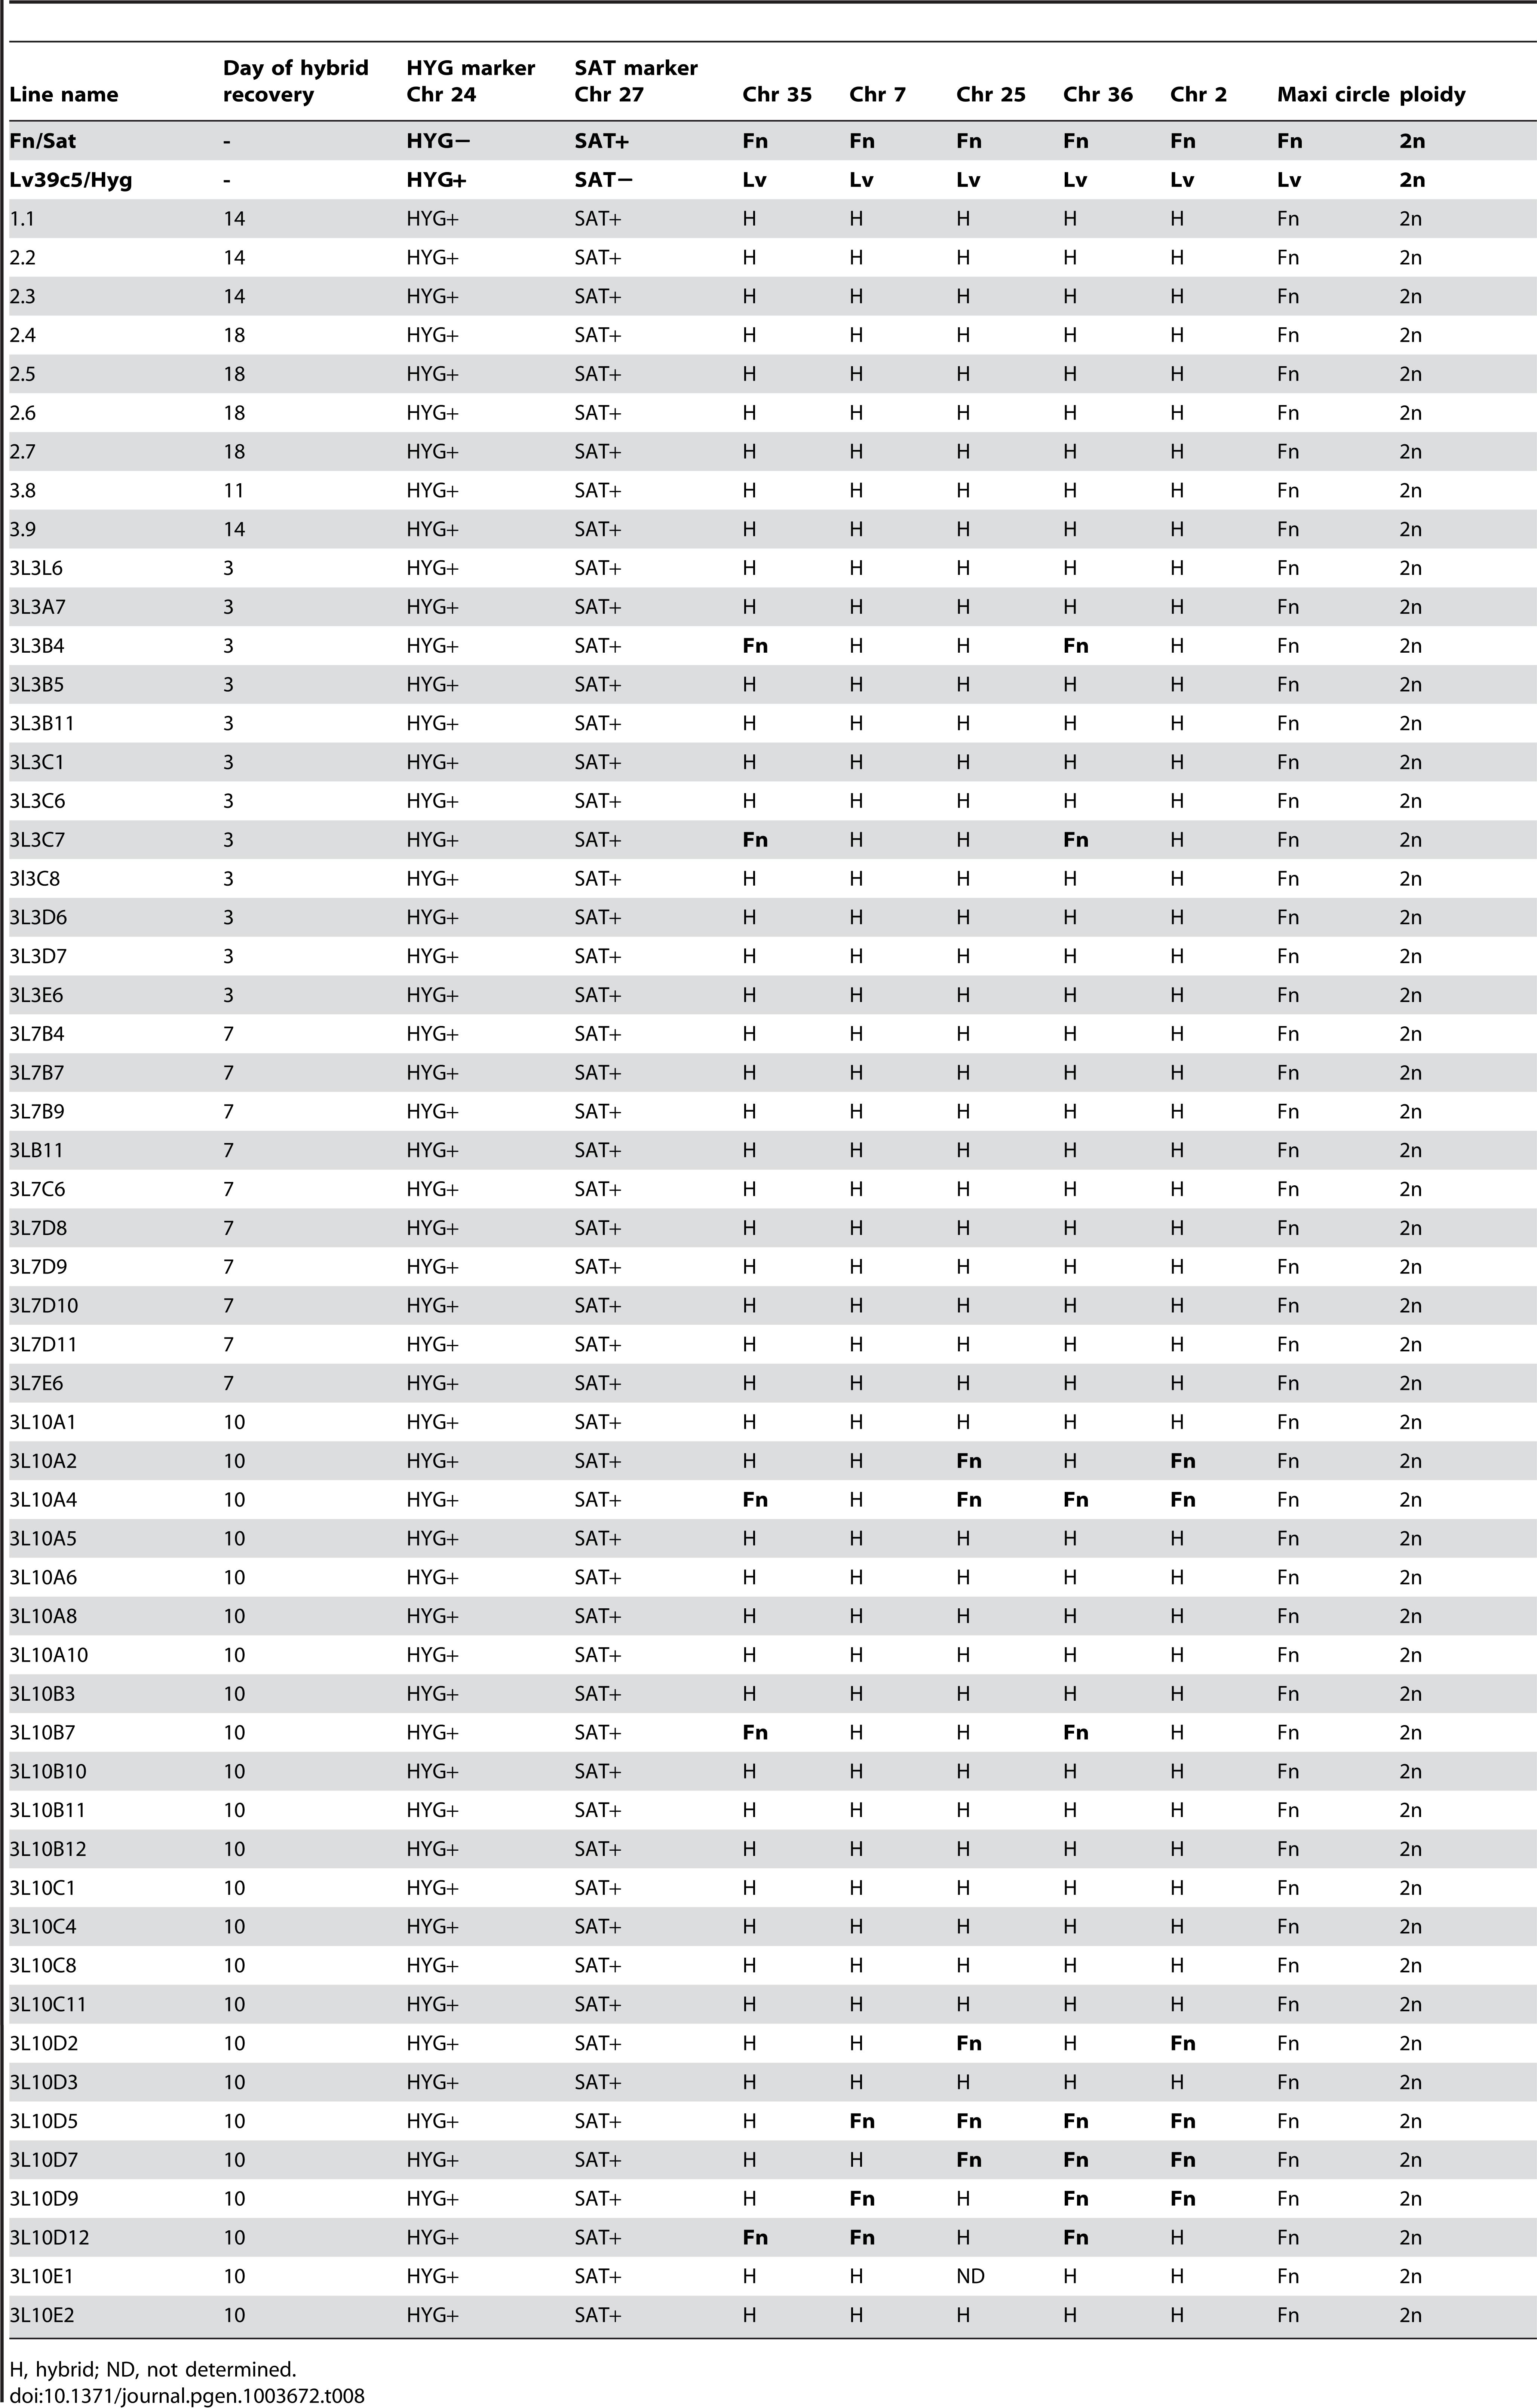 Summary of hybrid genotypes generated in <i>Lu. Longipalpis</i>.